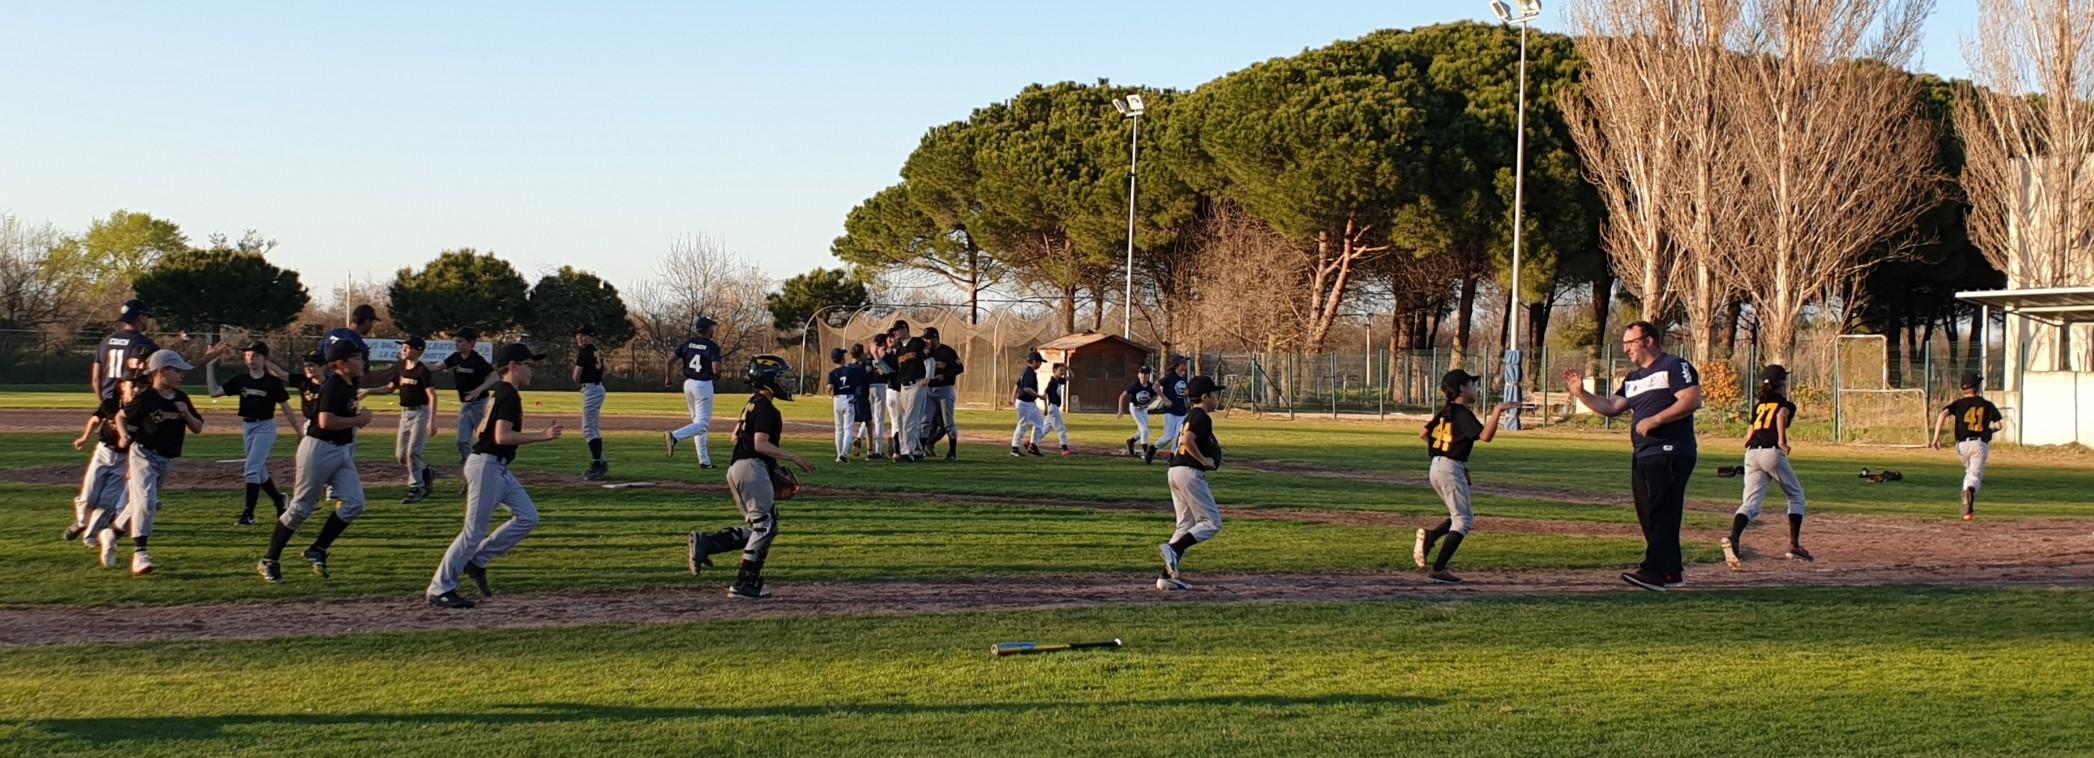 albatros-baseball-12U-23-03-19f